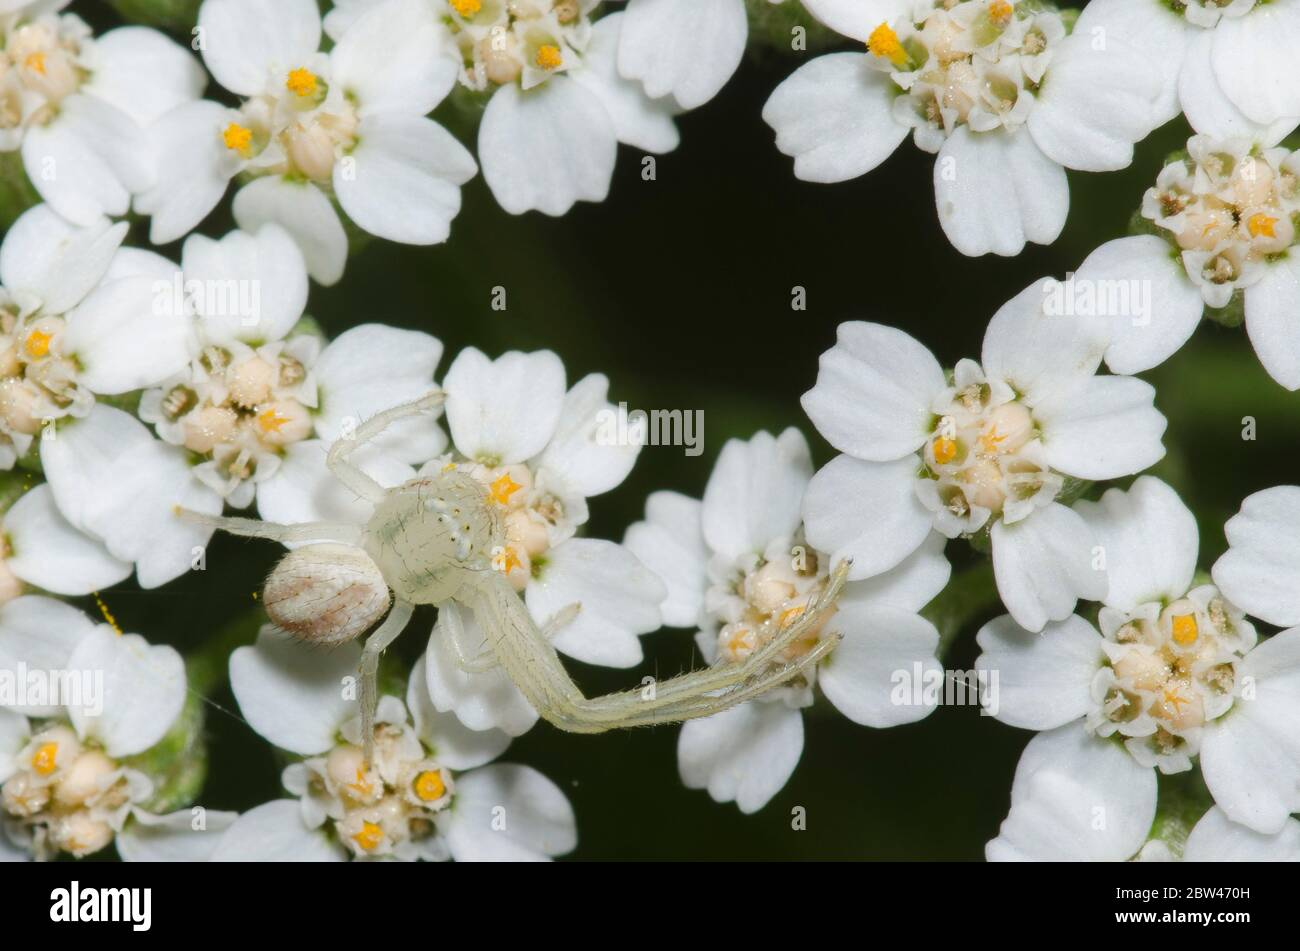 Crab Spider, Mecaphesa sp., with missing legs, lurking on yarrow, Achillea millefolium Stock Photo